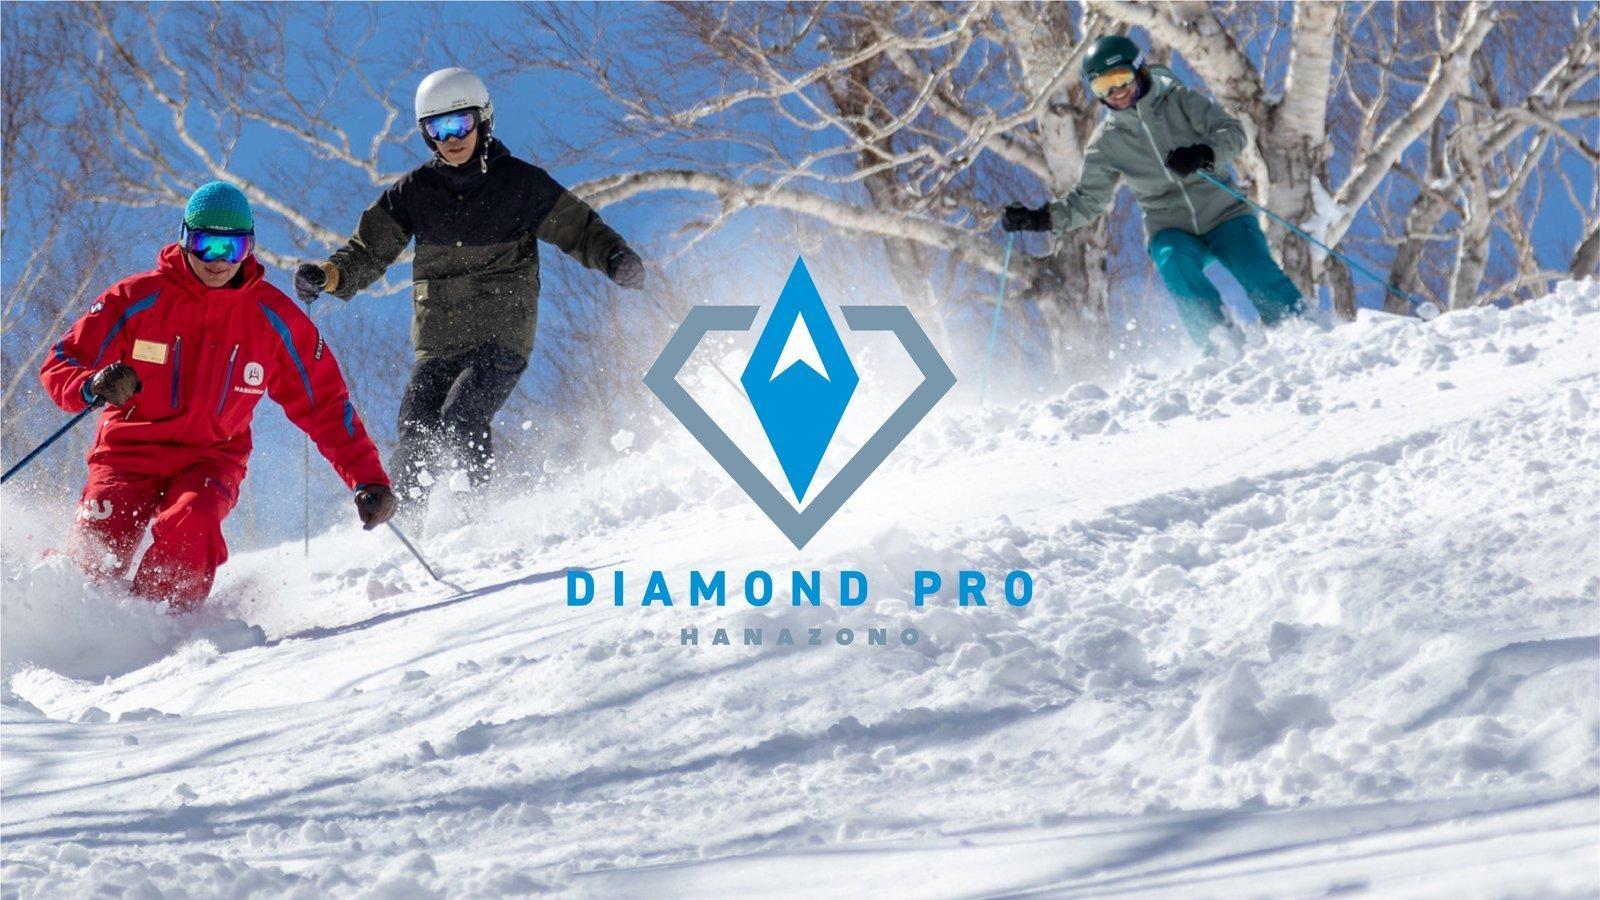 niss diamond pro ski lesson niseko